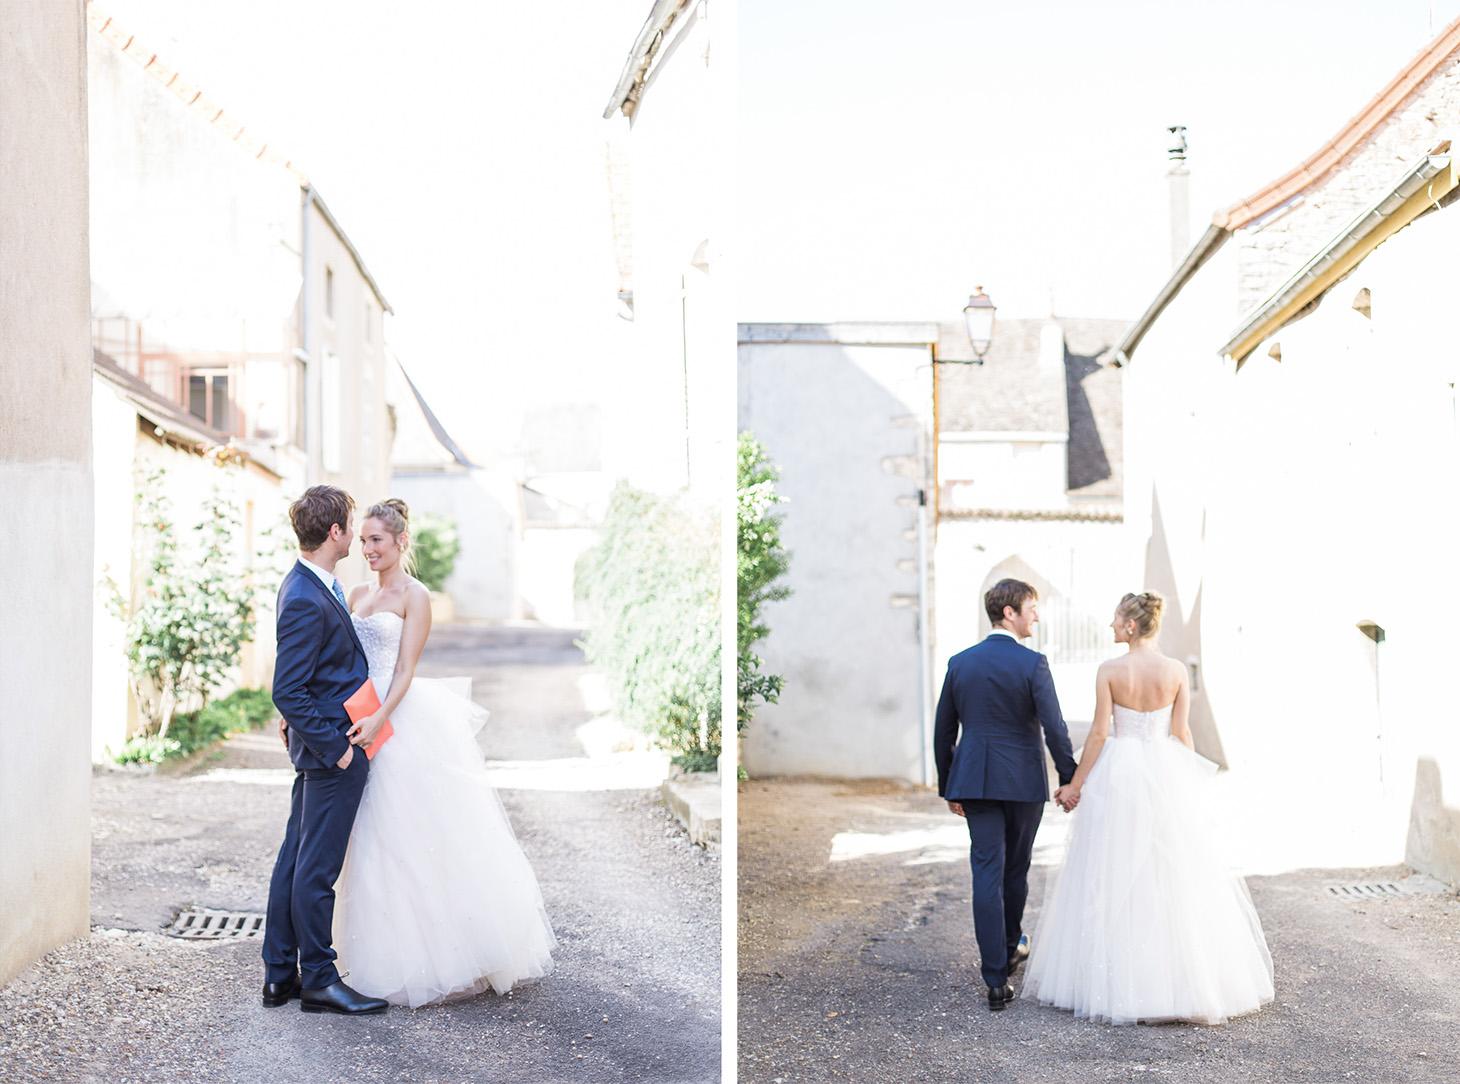 bourgogne_wedding_photographer_chateau_pommard-042 copie